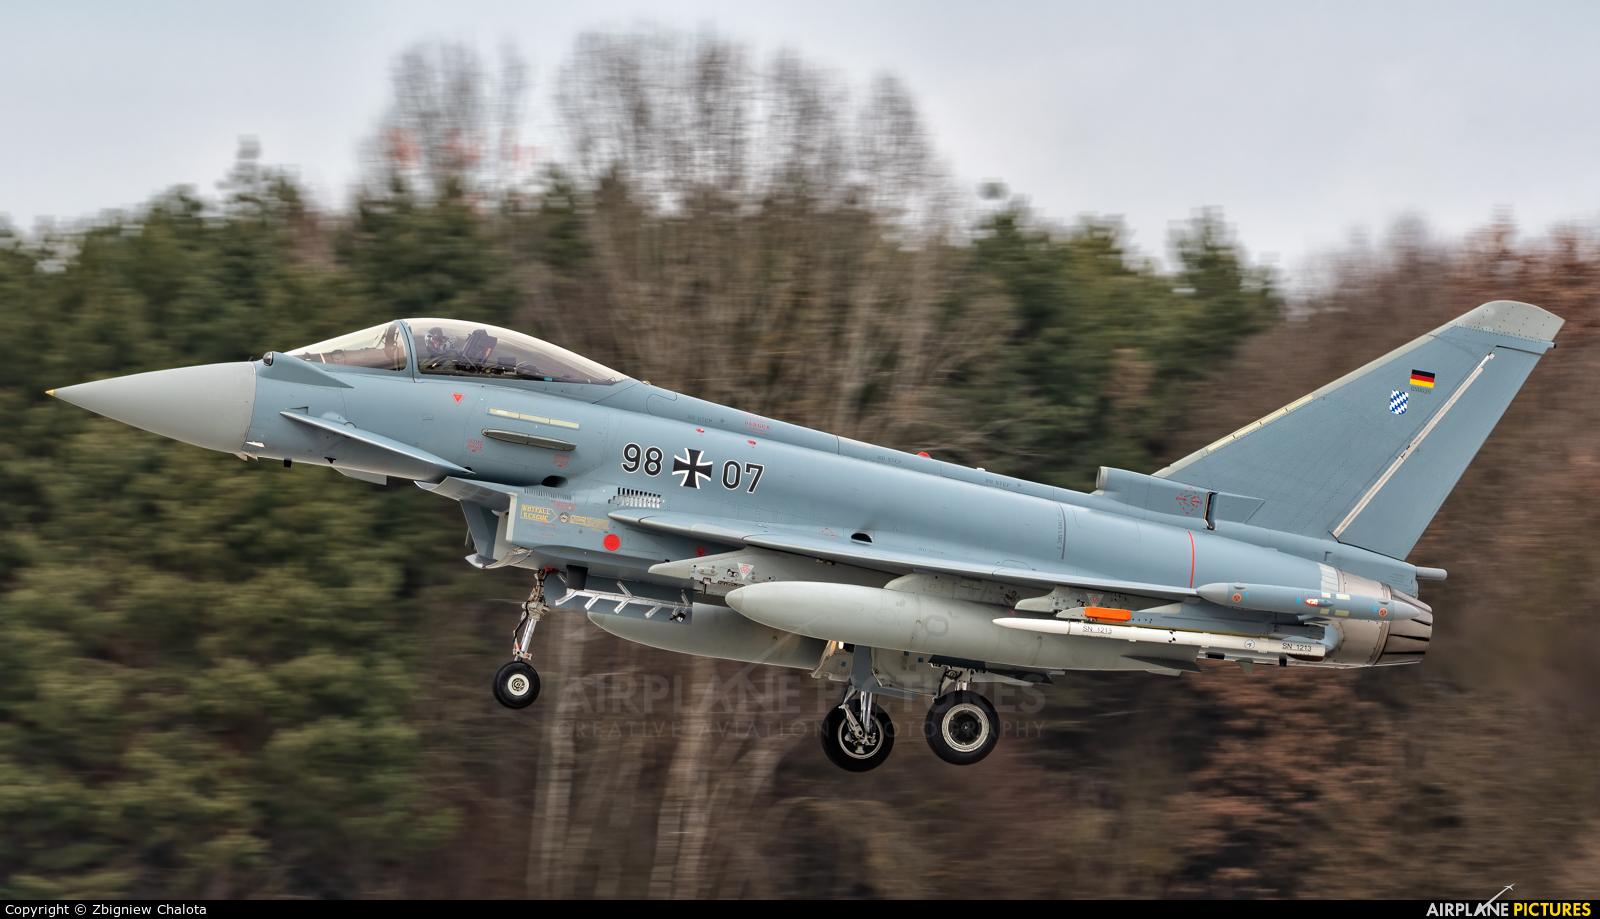 Germany - Air Force 98+07 aircraft at Ingolstadt - Manching